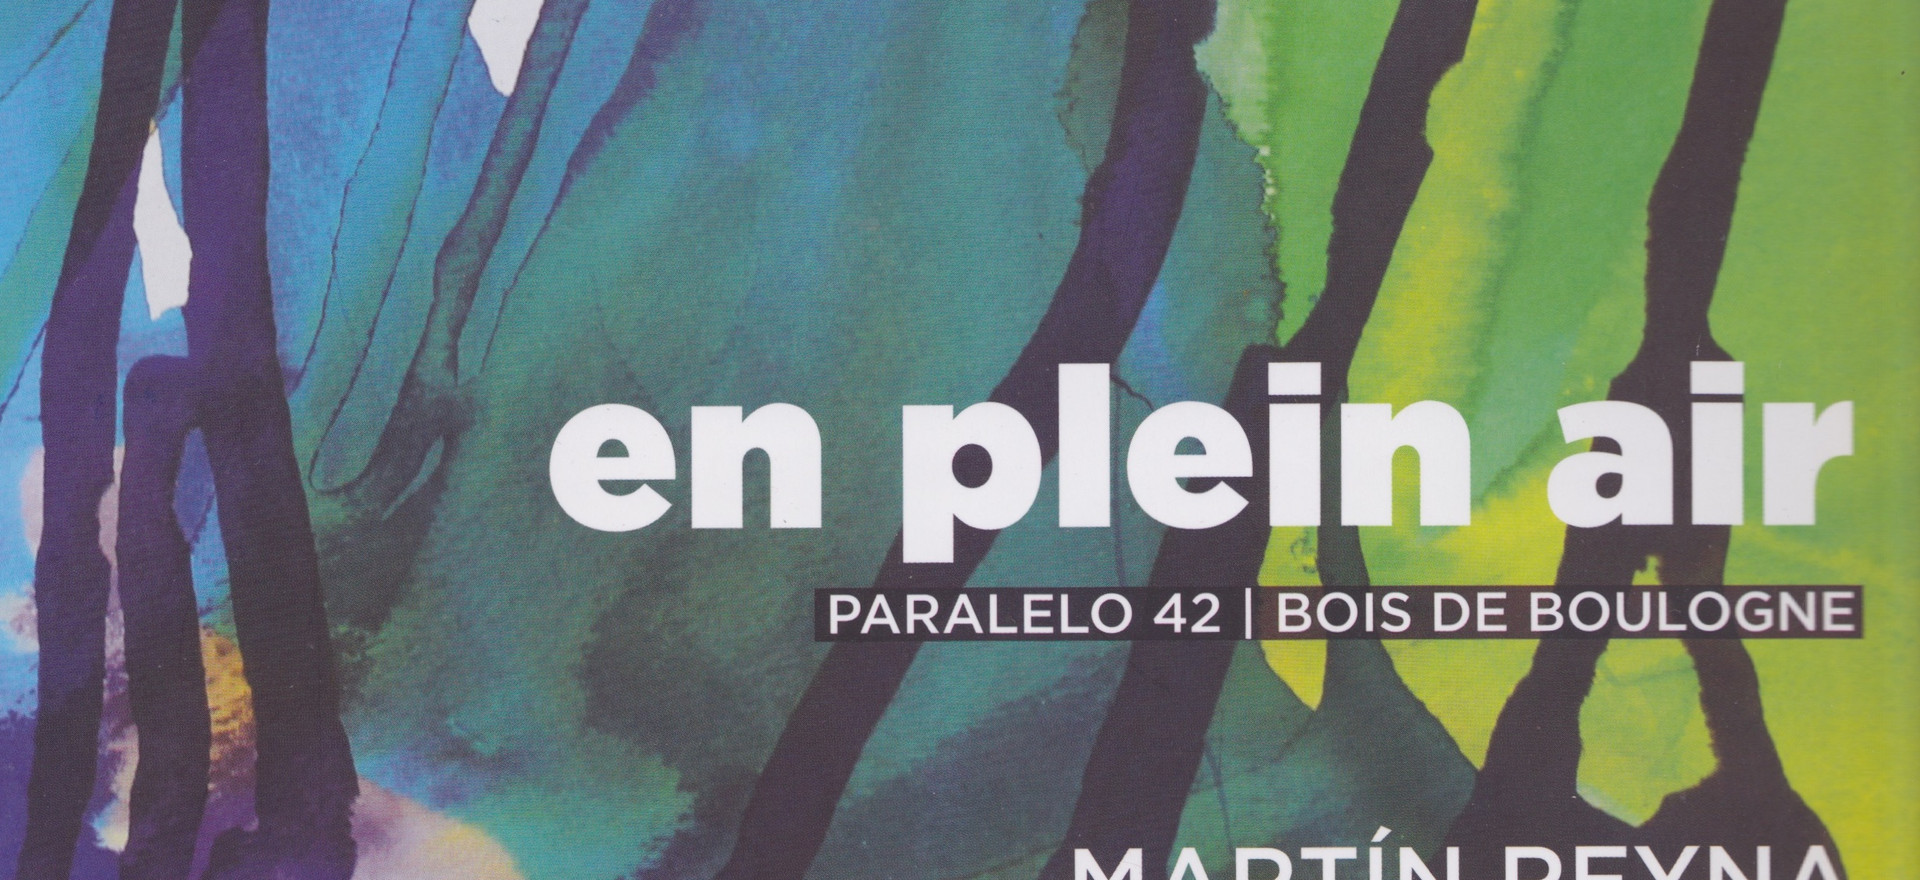 En plein air, 2015, textes: Herminia Mérega, Martín Reyna, Sarah T. Reyna, Horacio Spinetto et Bruno Tessarech; Editions Herminia Mérega, Buenos Aires, Argentine